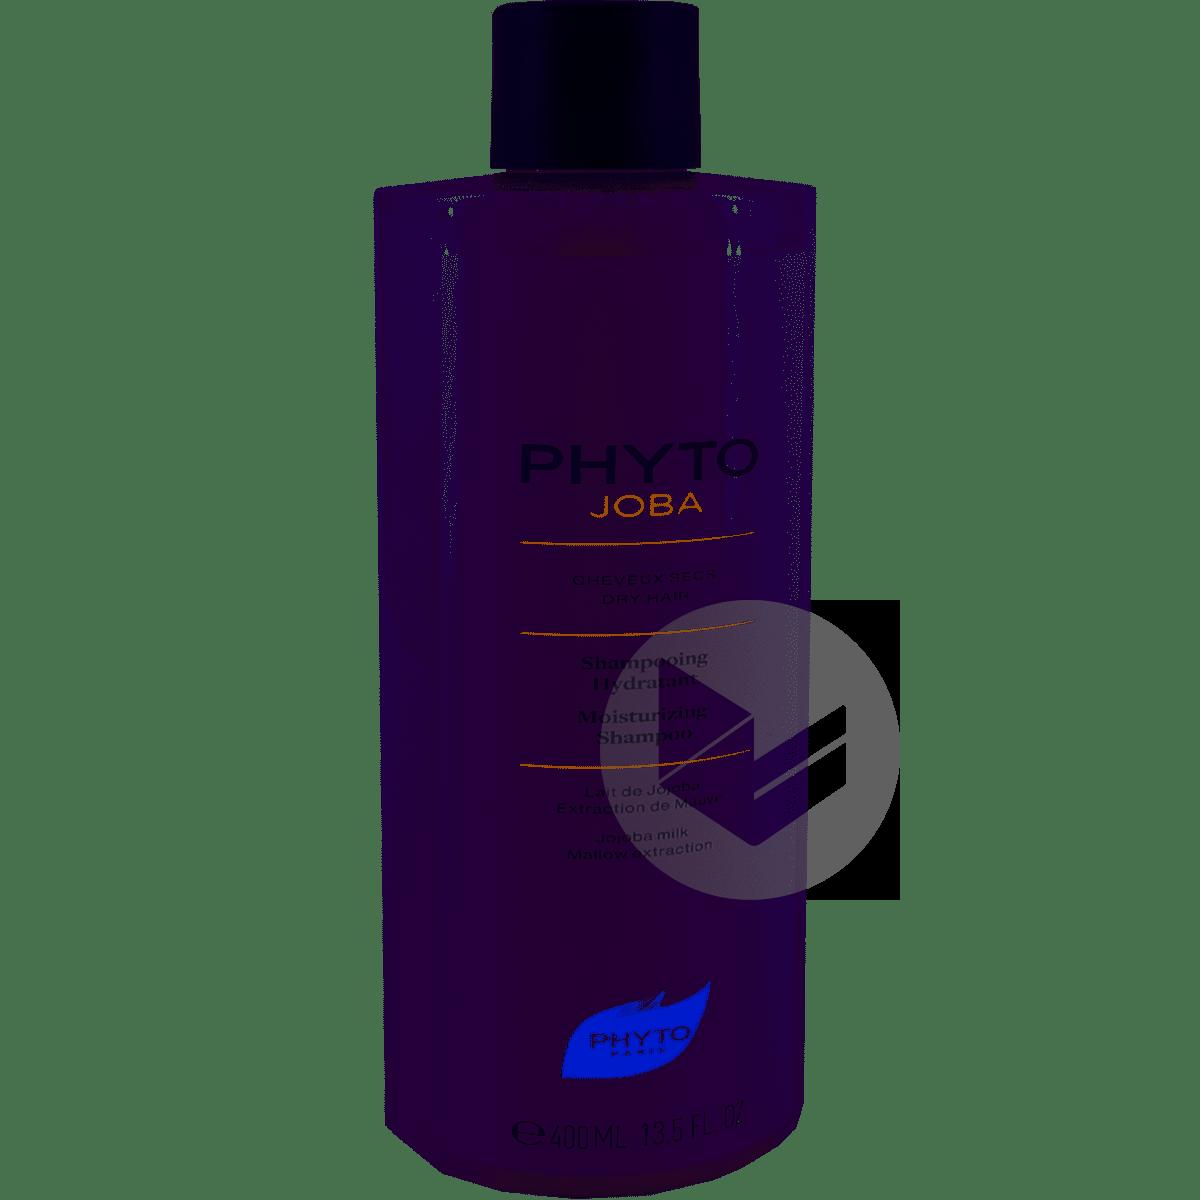 Joba Shampooing Hydratant 400 Ml